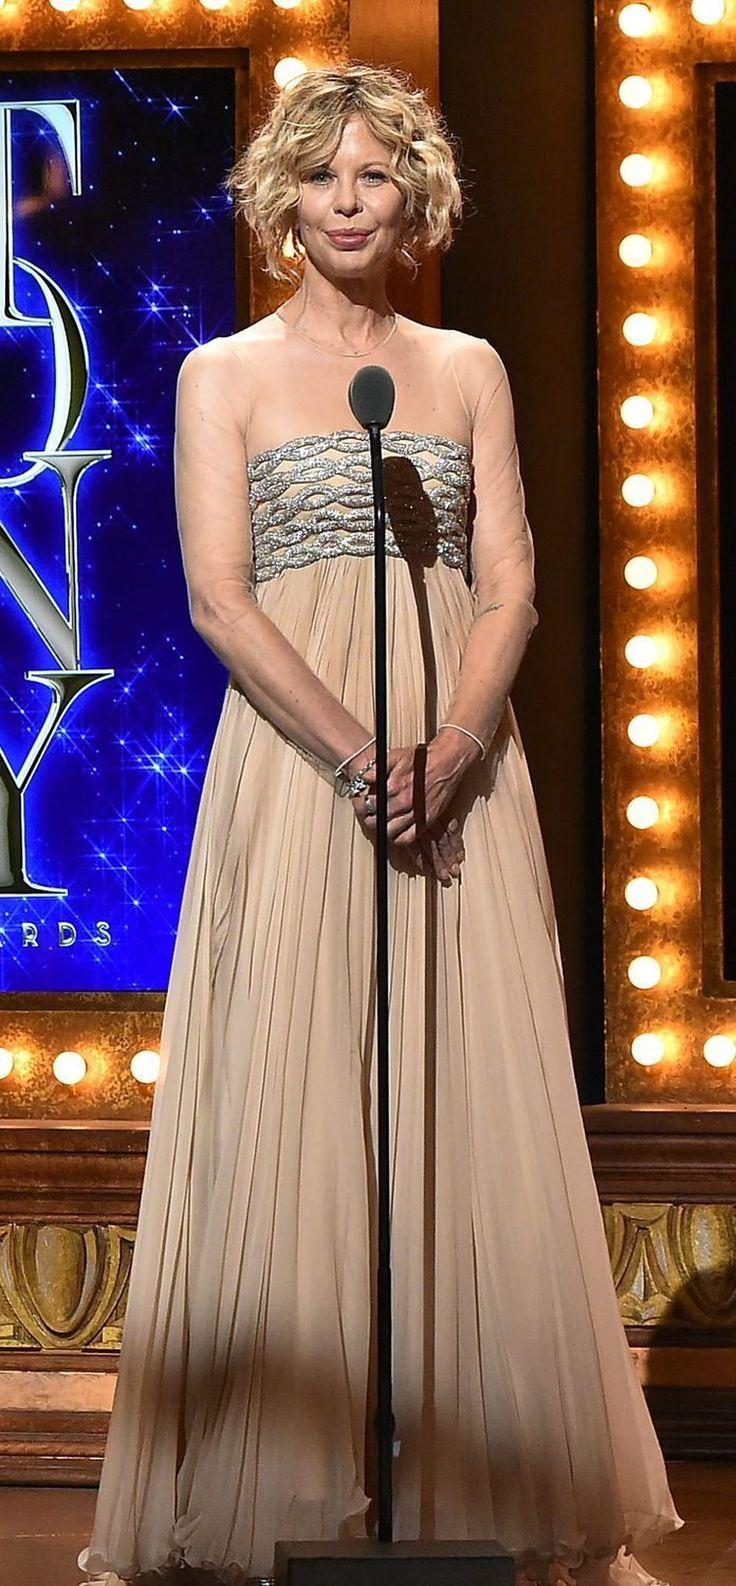 La cara de Meg Ryan impressiona  #Actriu #MegRyan #PremisTony #Estètica La #BeaconTheatre